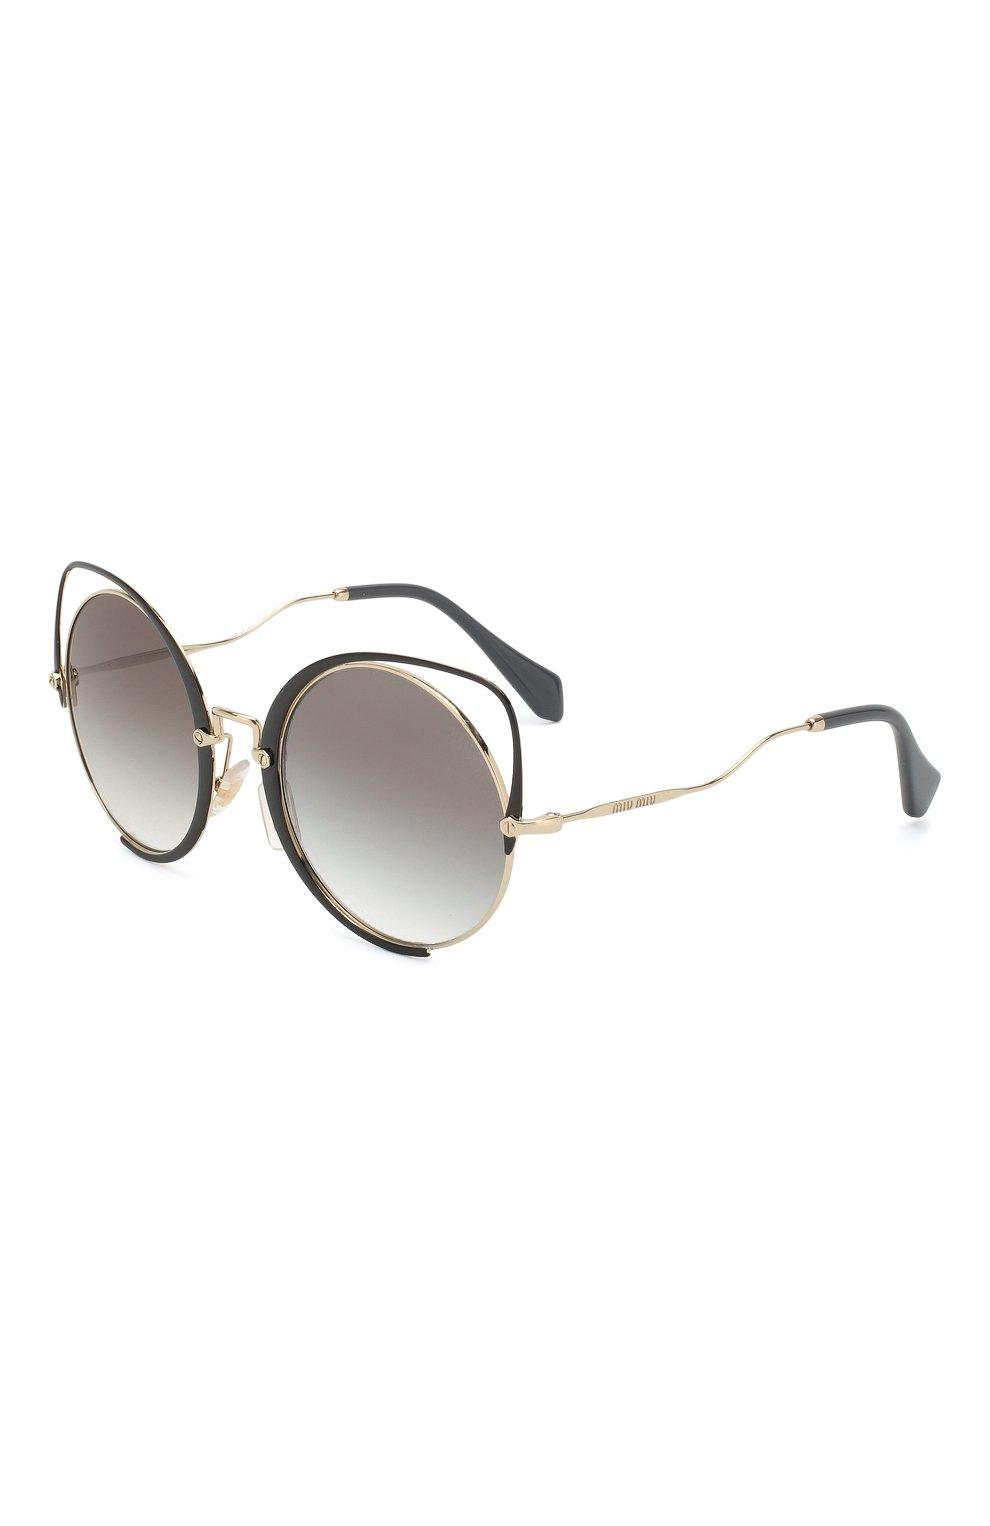 Женские солнцезащитные очки MIU MIU черного цвета, арт. 51TS-1AB0A7 | Фото 1